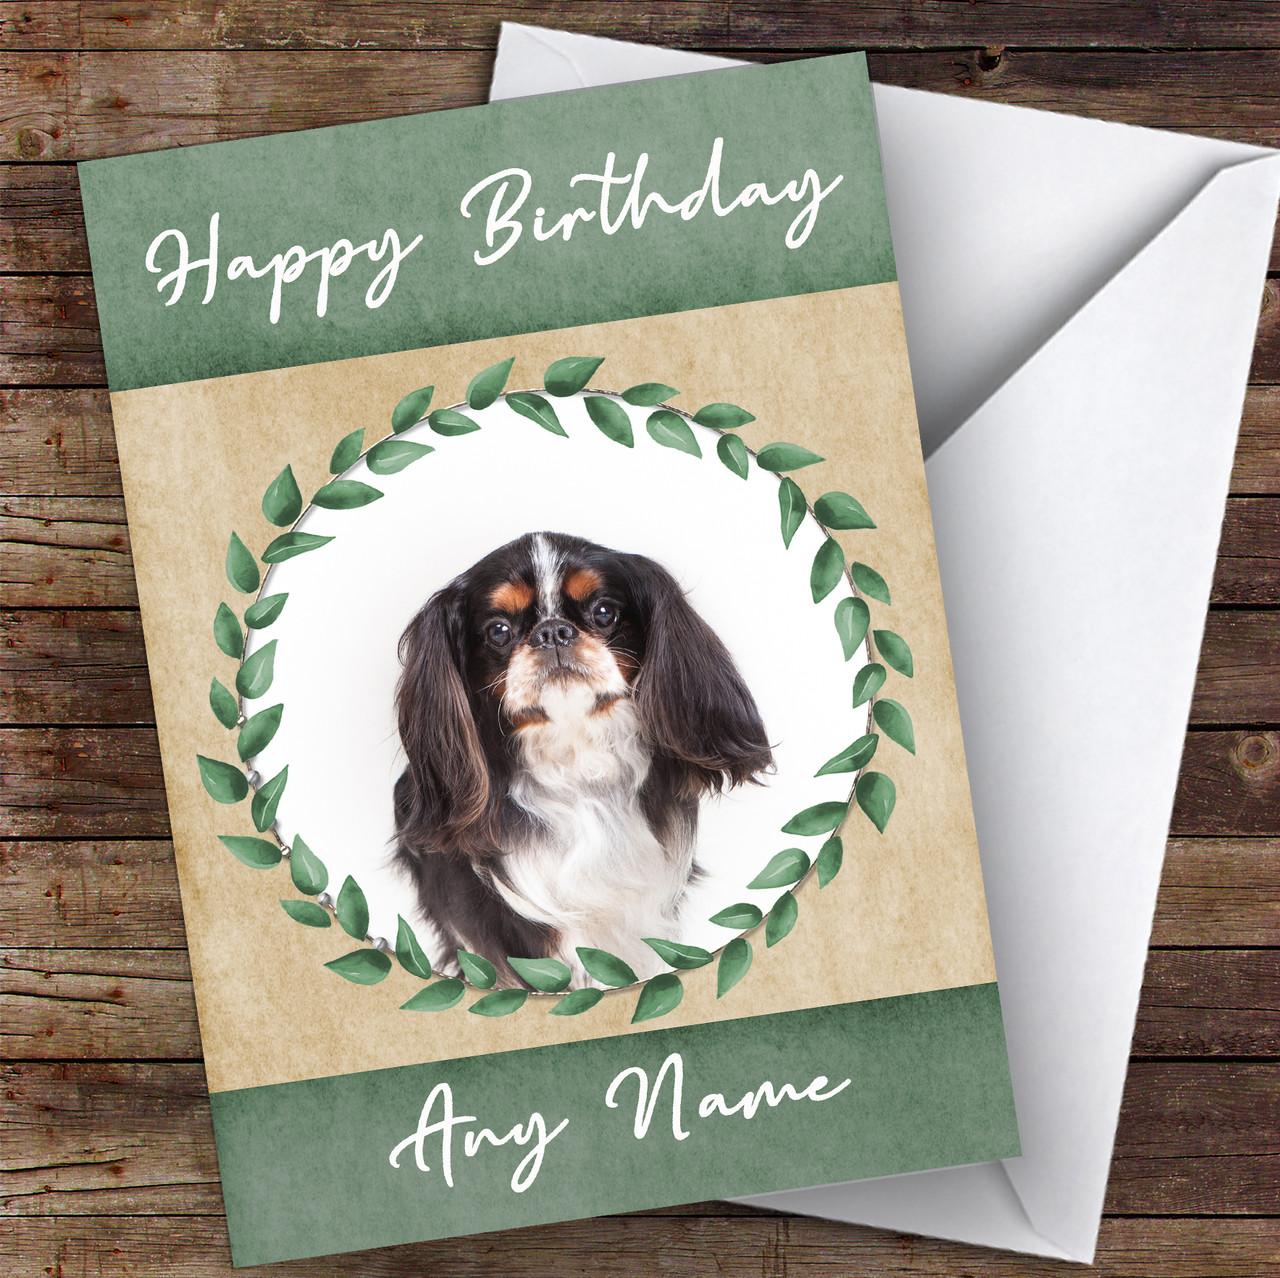 KING CHARLES ENGLISH TOY SPANIEL DOG BIRTHDAY GREETINGS NOTE CARD